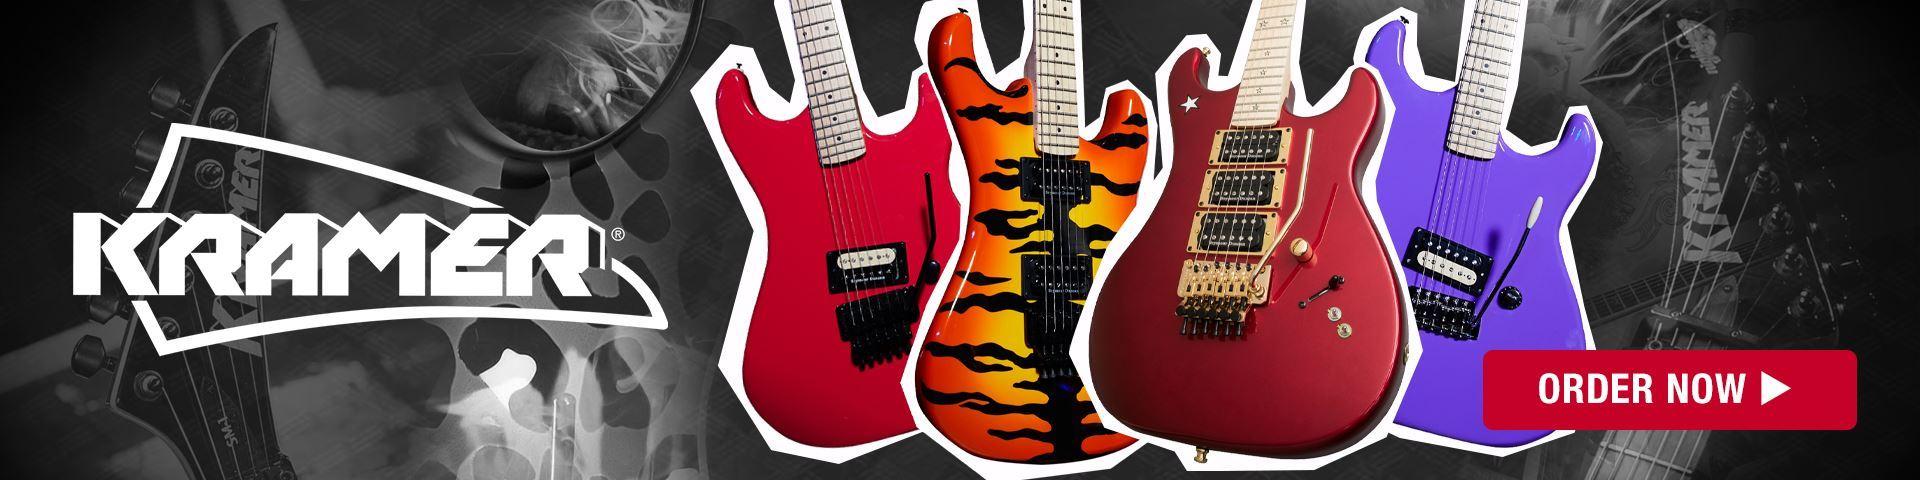 Kramer Electric Guitars - Coming Soon to Mega Music.